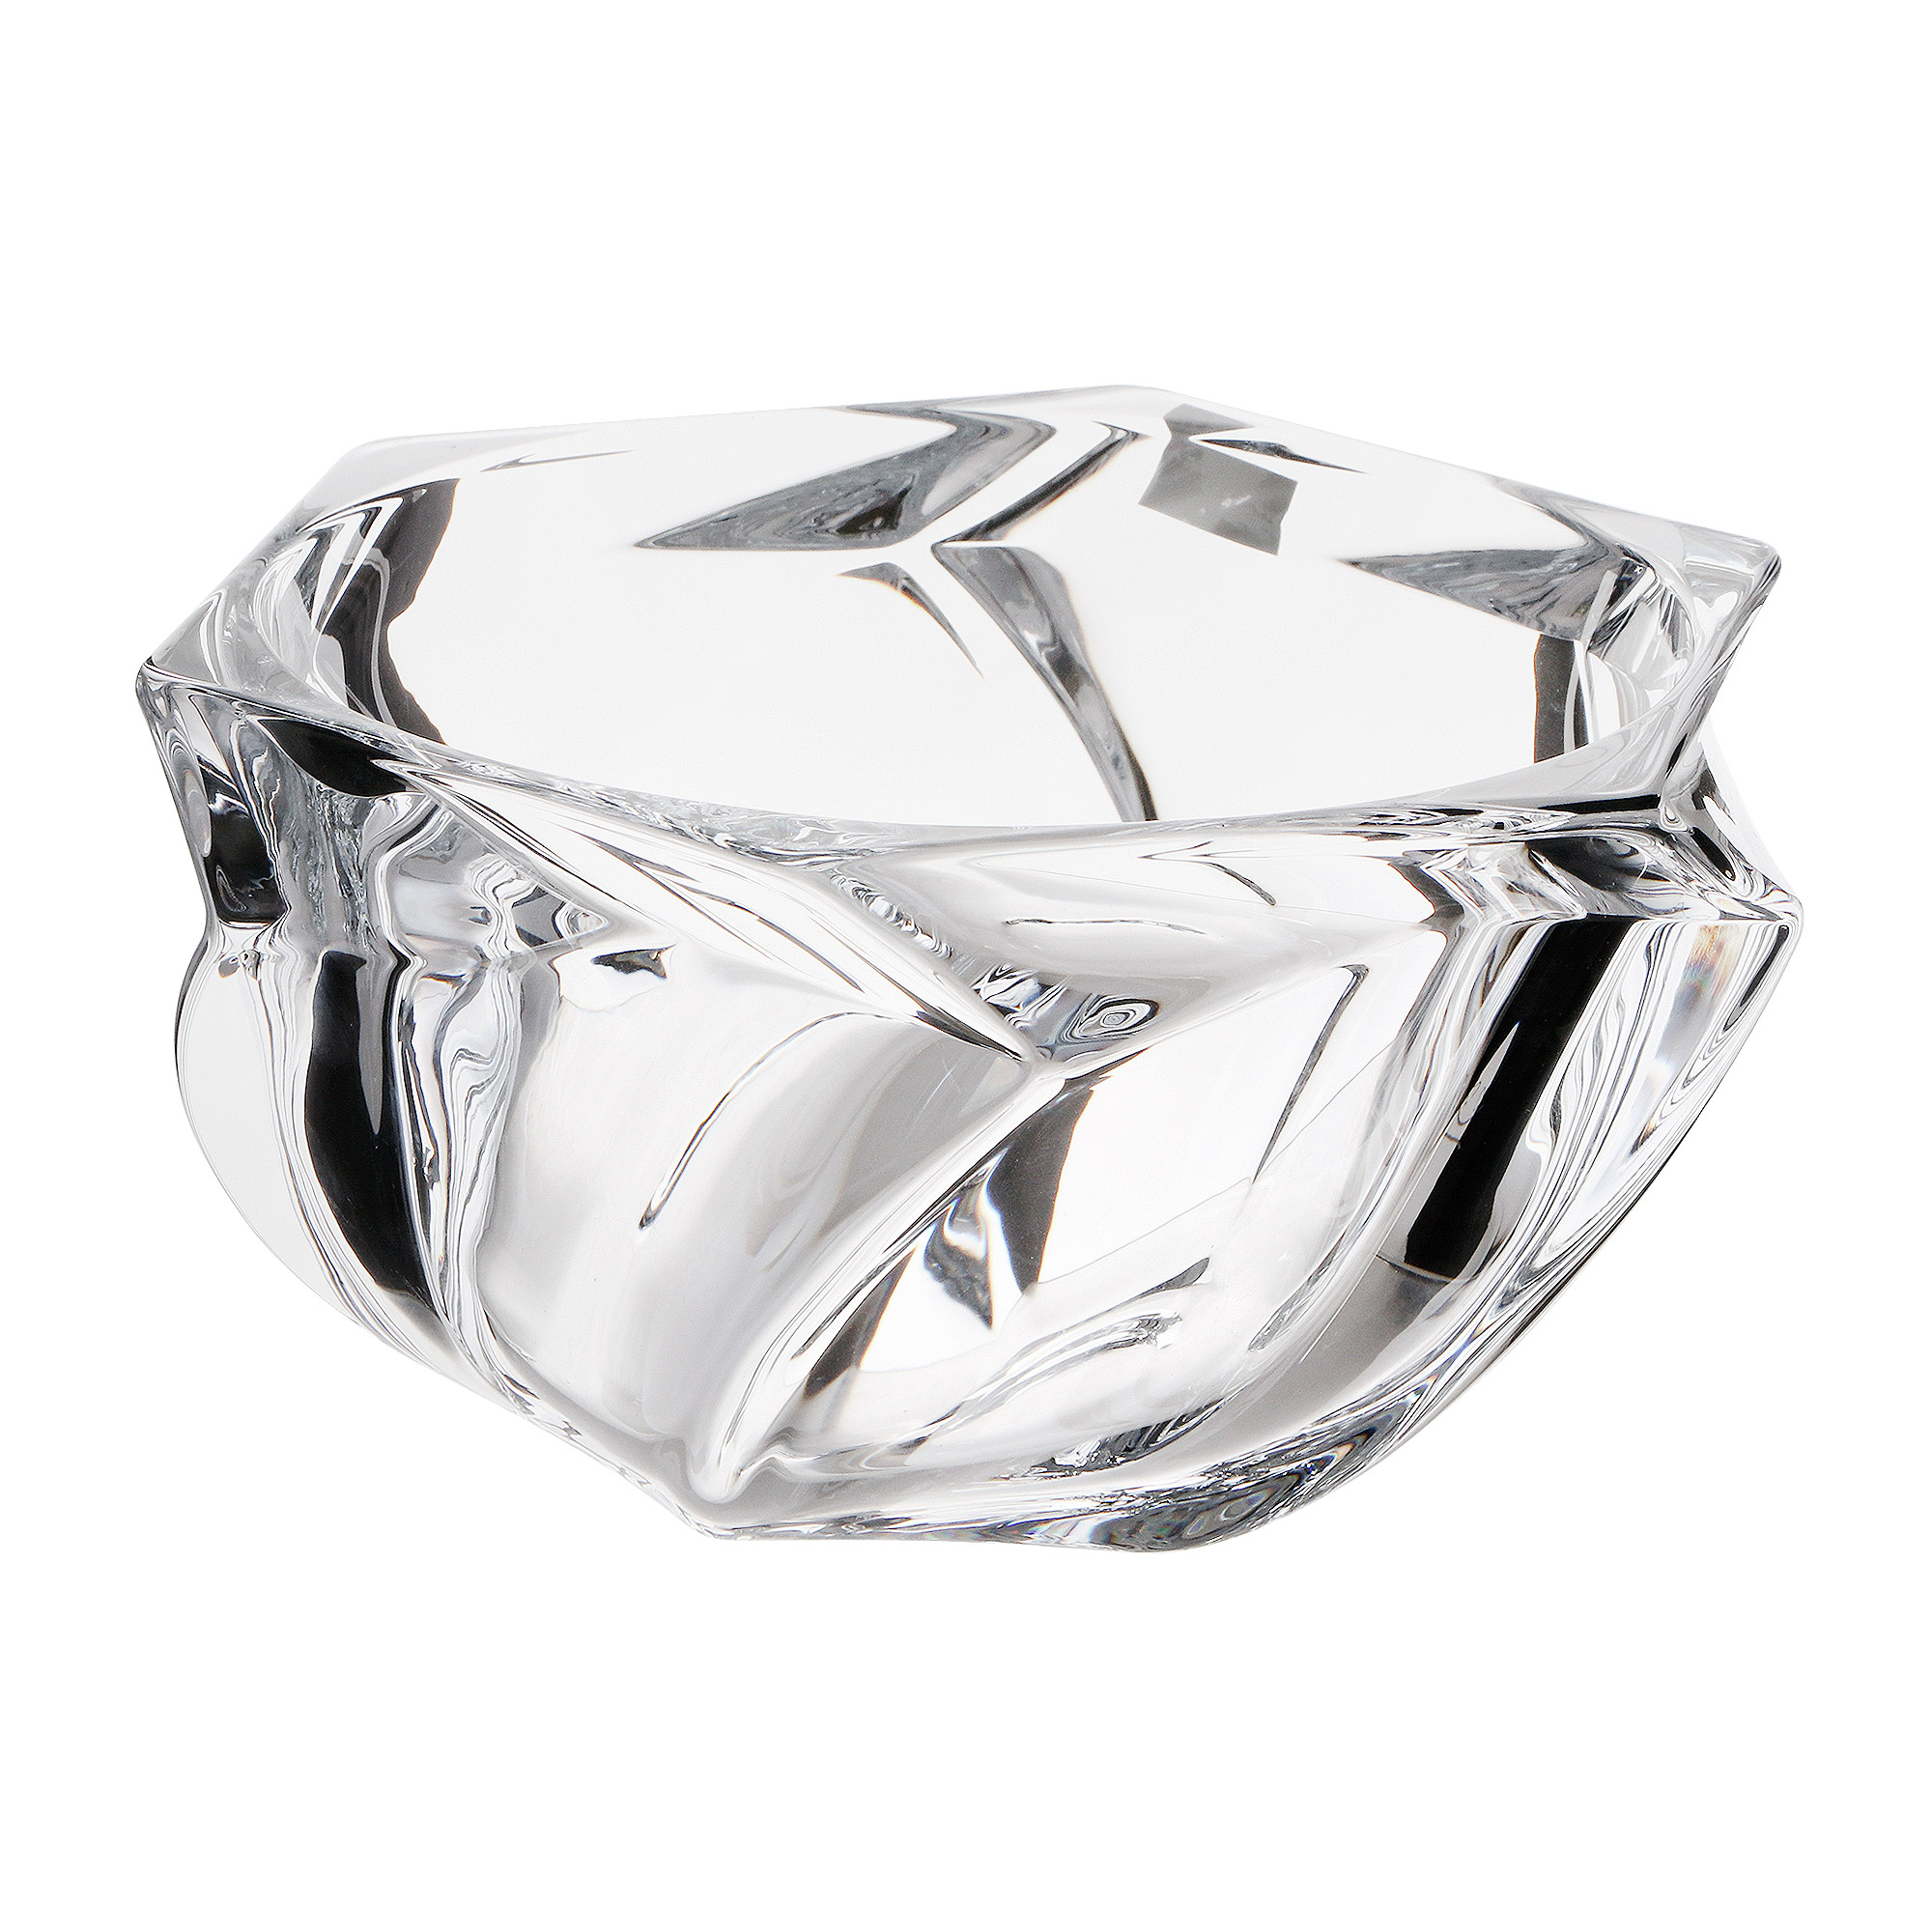 Салатник Crystalite Bohemia Macao 20,5 см салатник 21 см crystalite bohemia